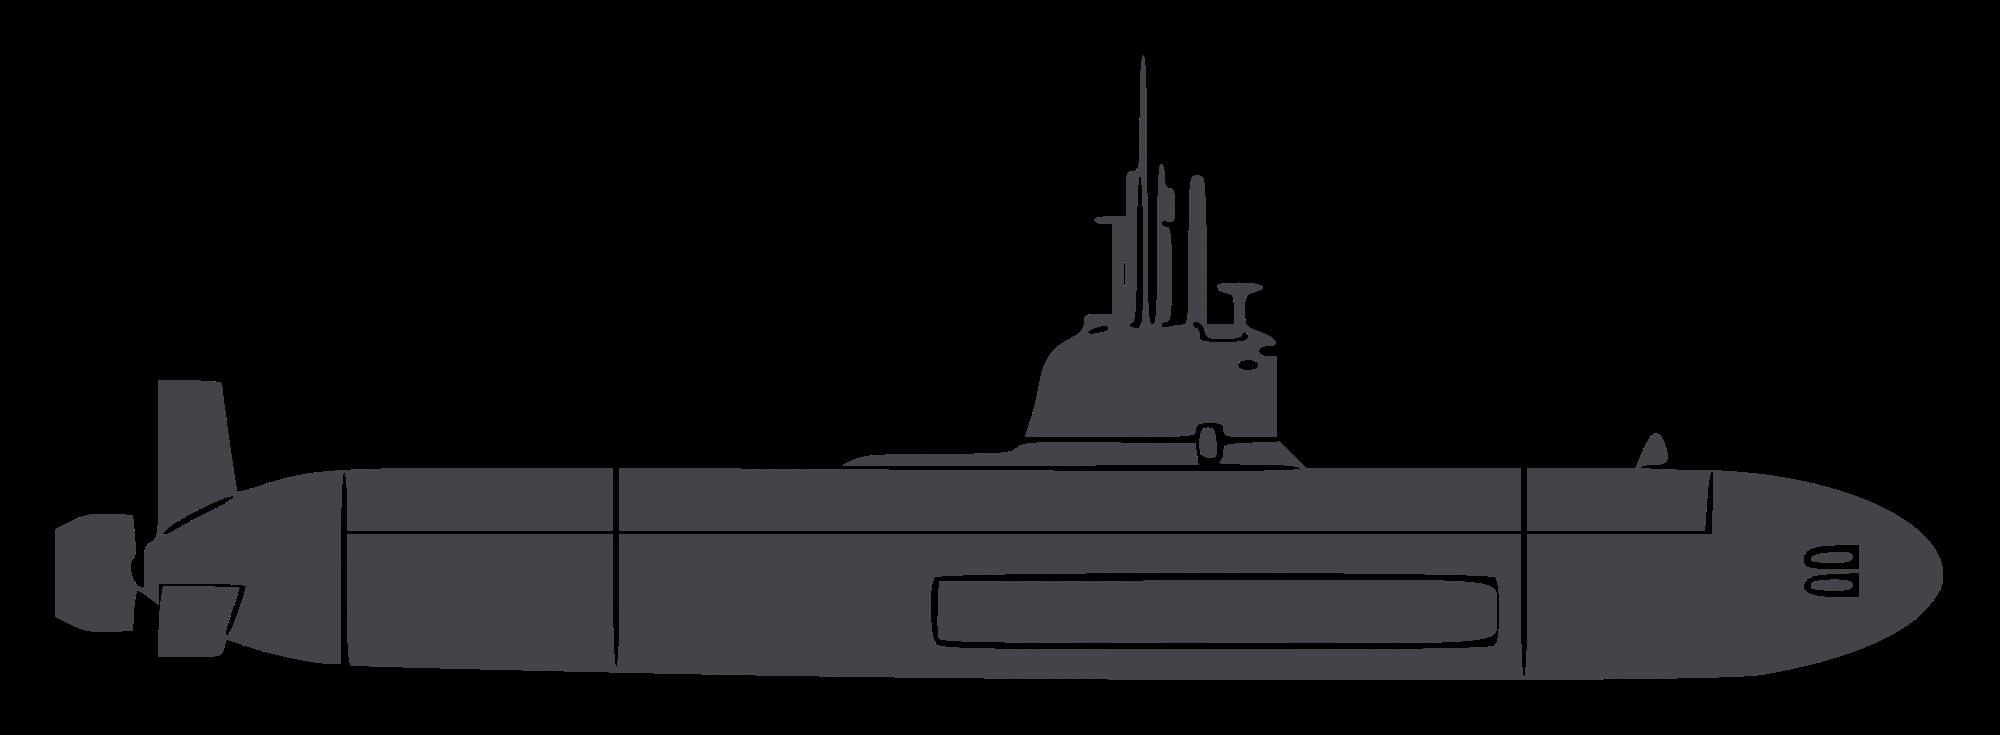 jpg black and white library submarine vector navy chinese #115974868